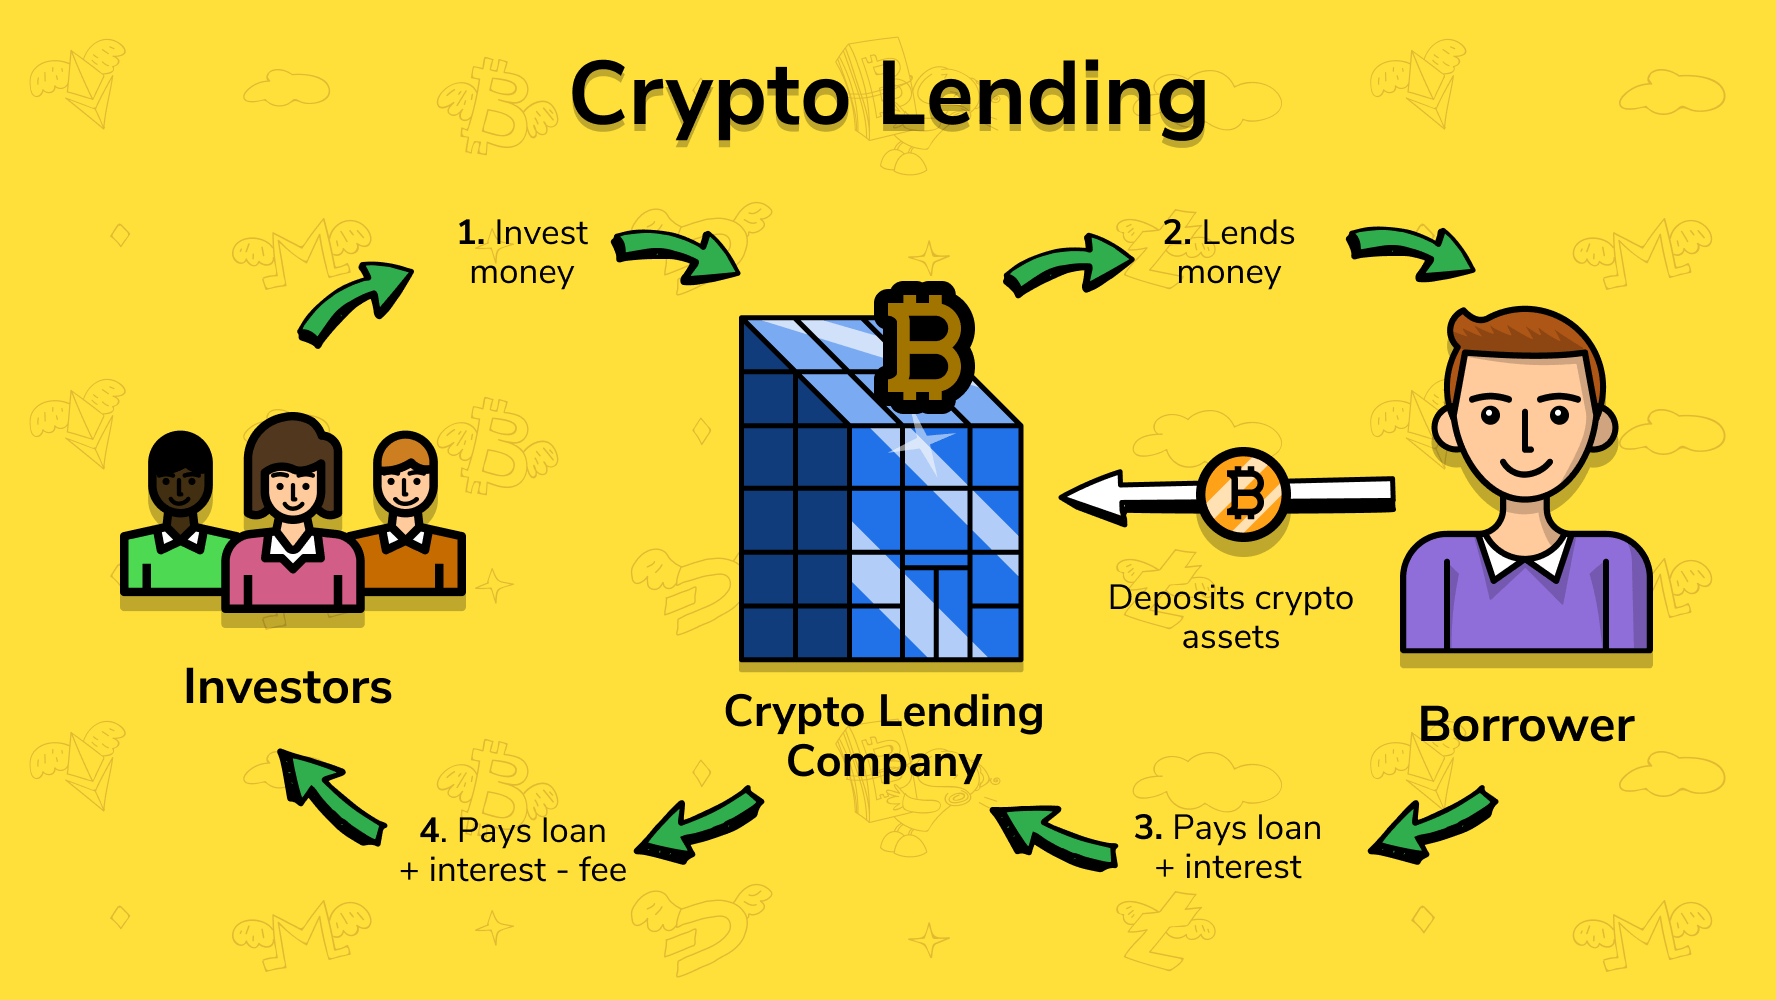 lend2 - Crypto Lending Explained 2021